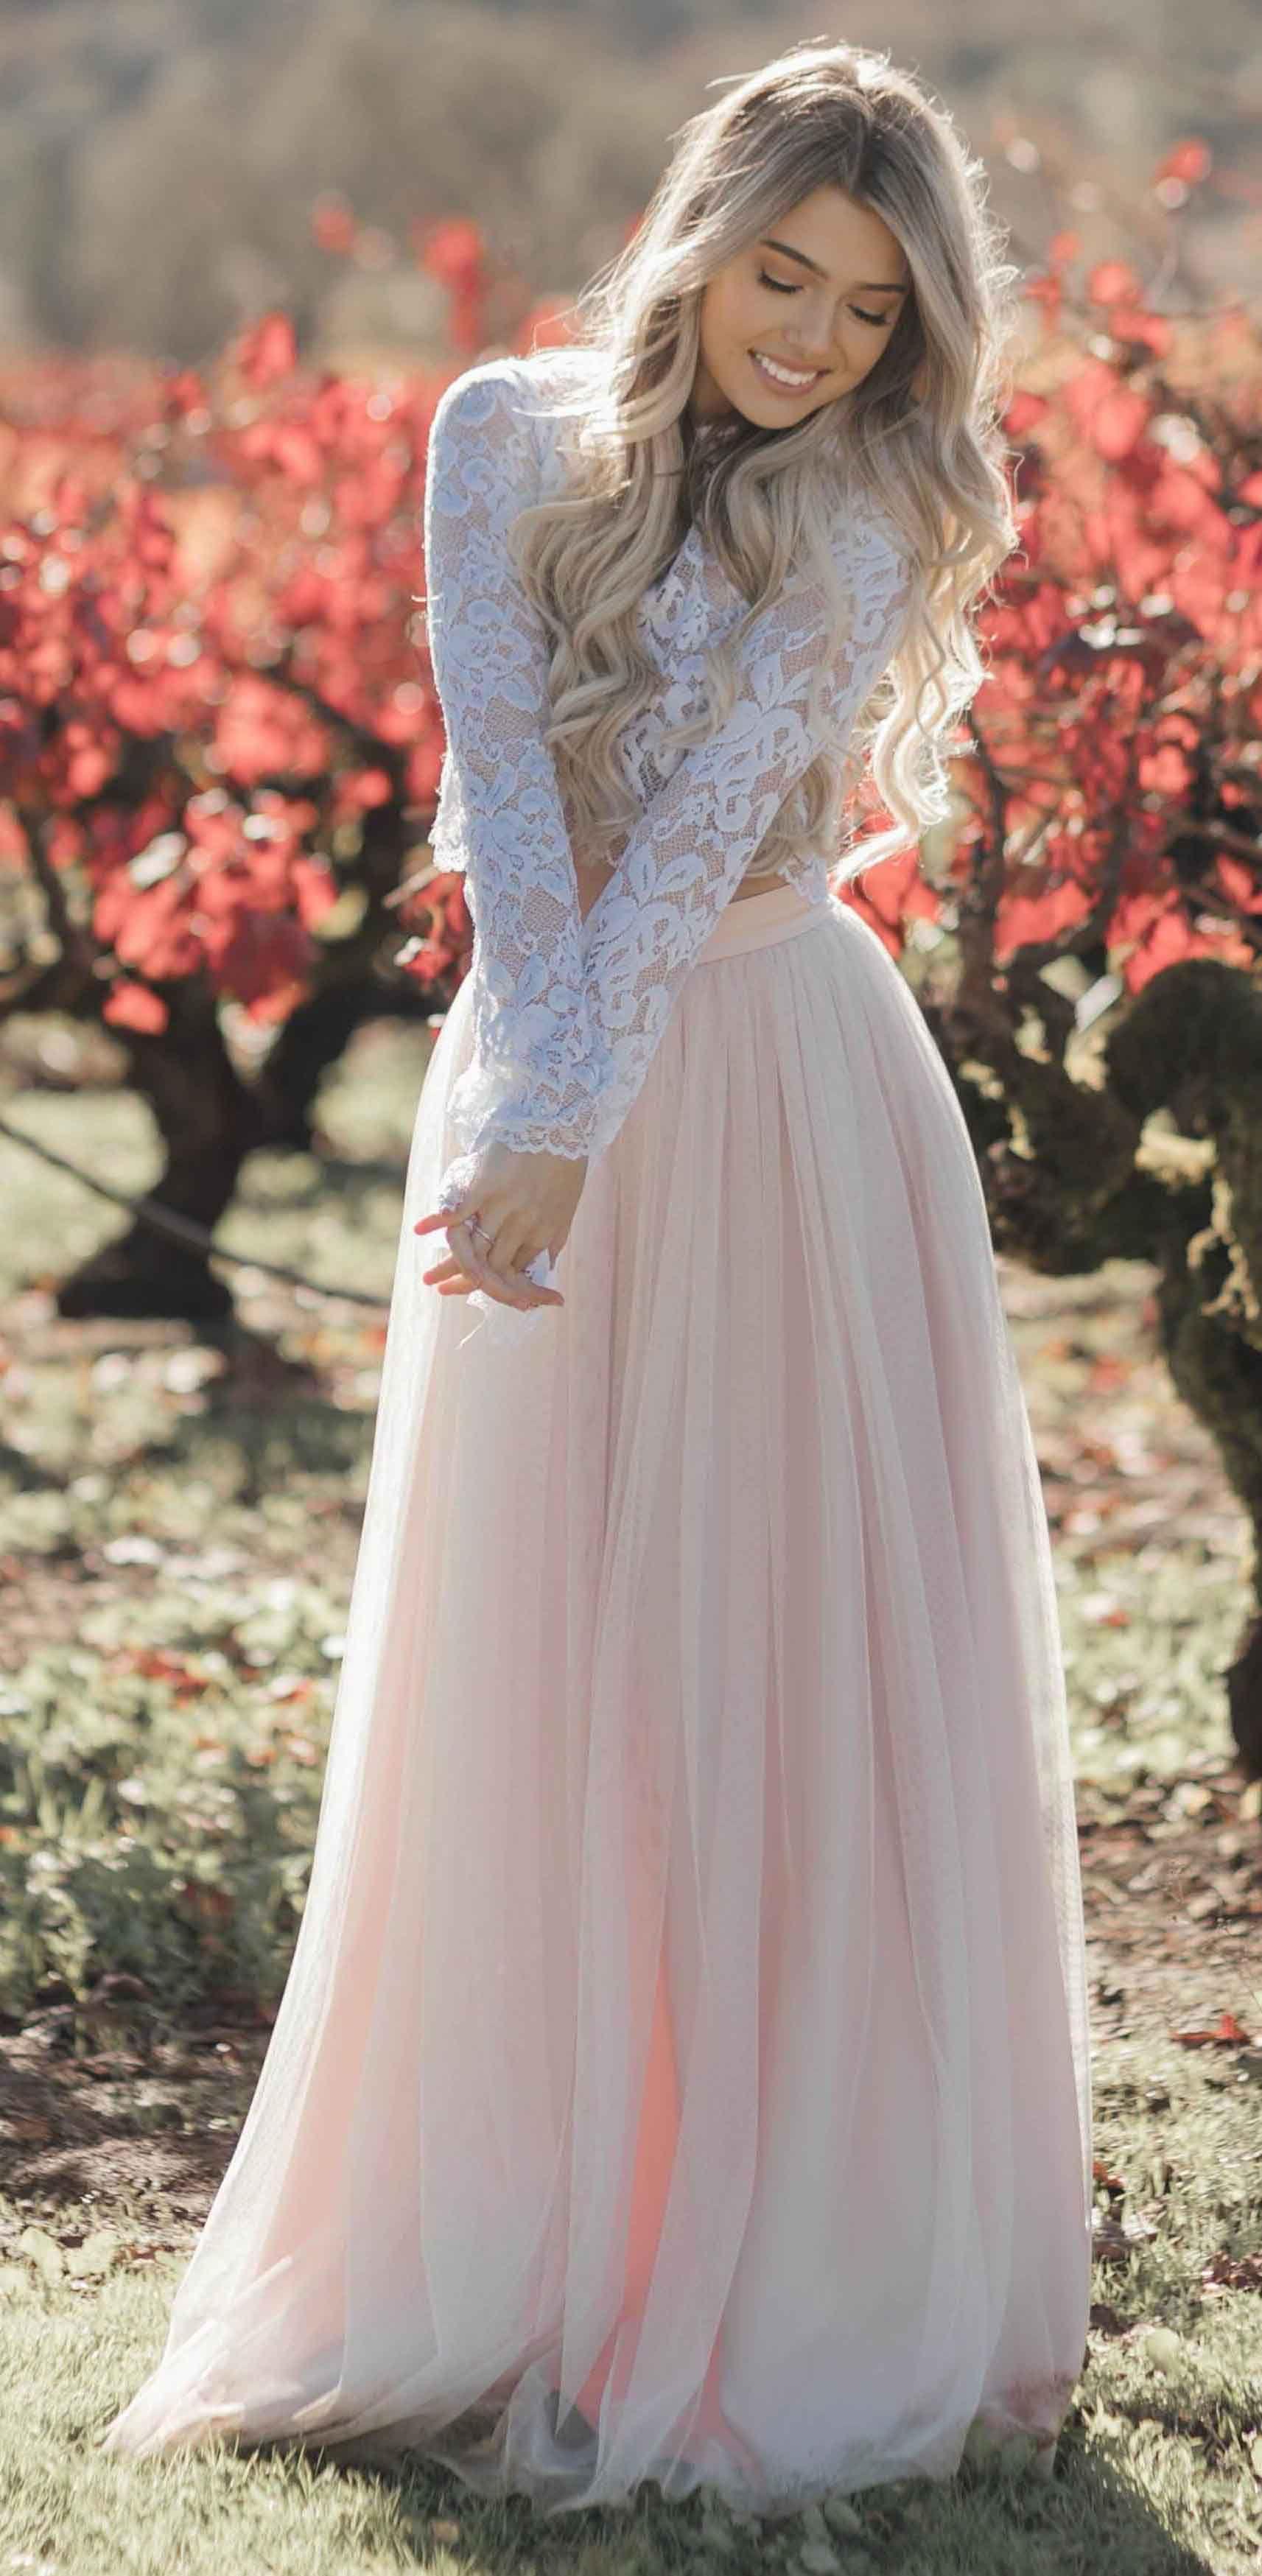 Blush Pink Wedding Dresses Country Weding Dresses Bohemian Wedding Dress Rustic W Long Sleeve Wedding Dress Lace Blush Pink Wedding Dress Online Wedding Dress [ 3497 x 1713 Pixel ]